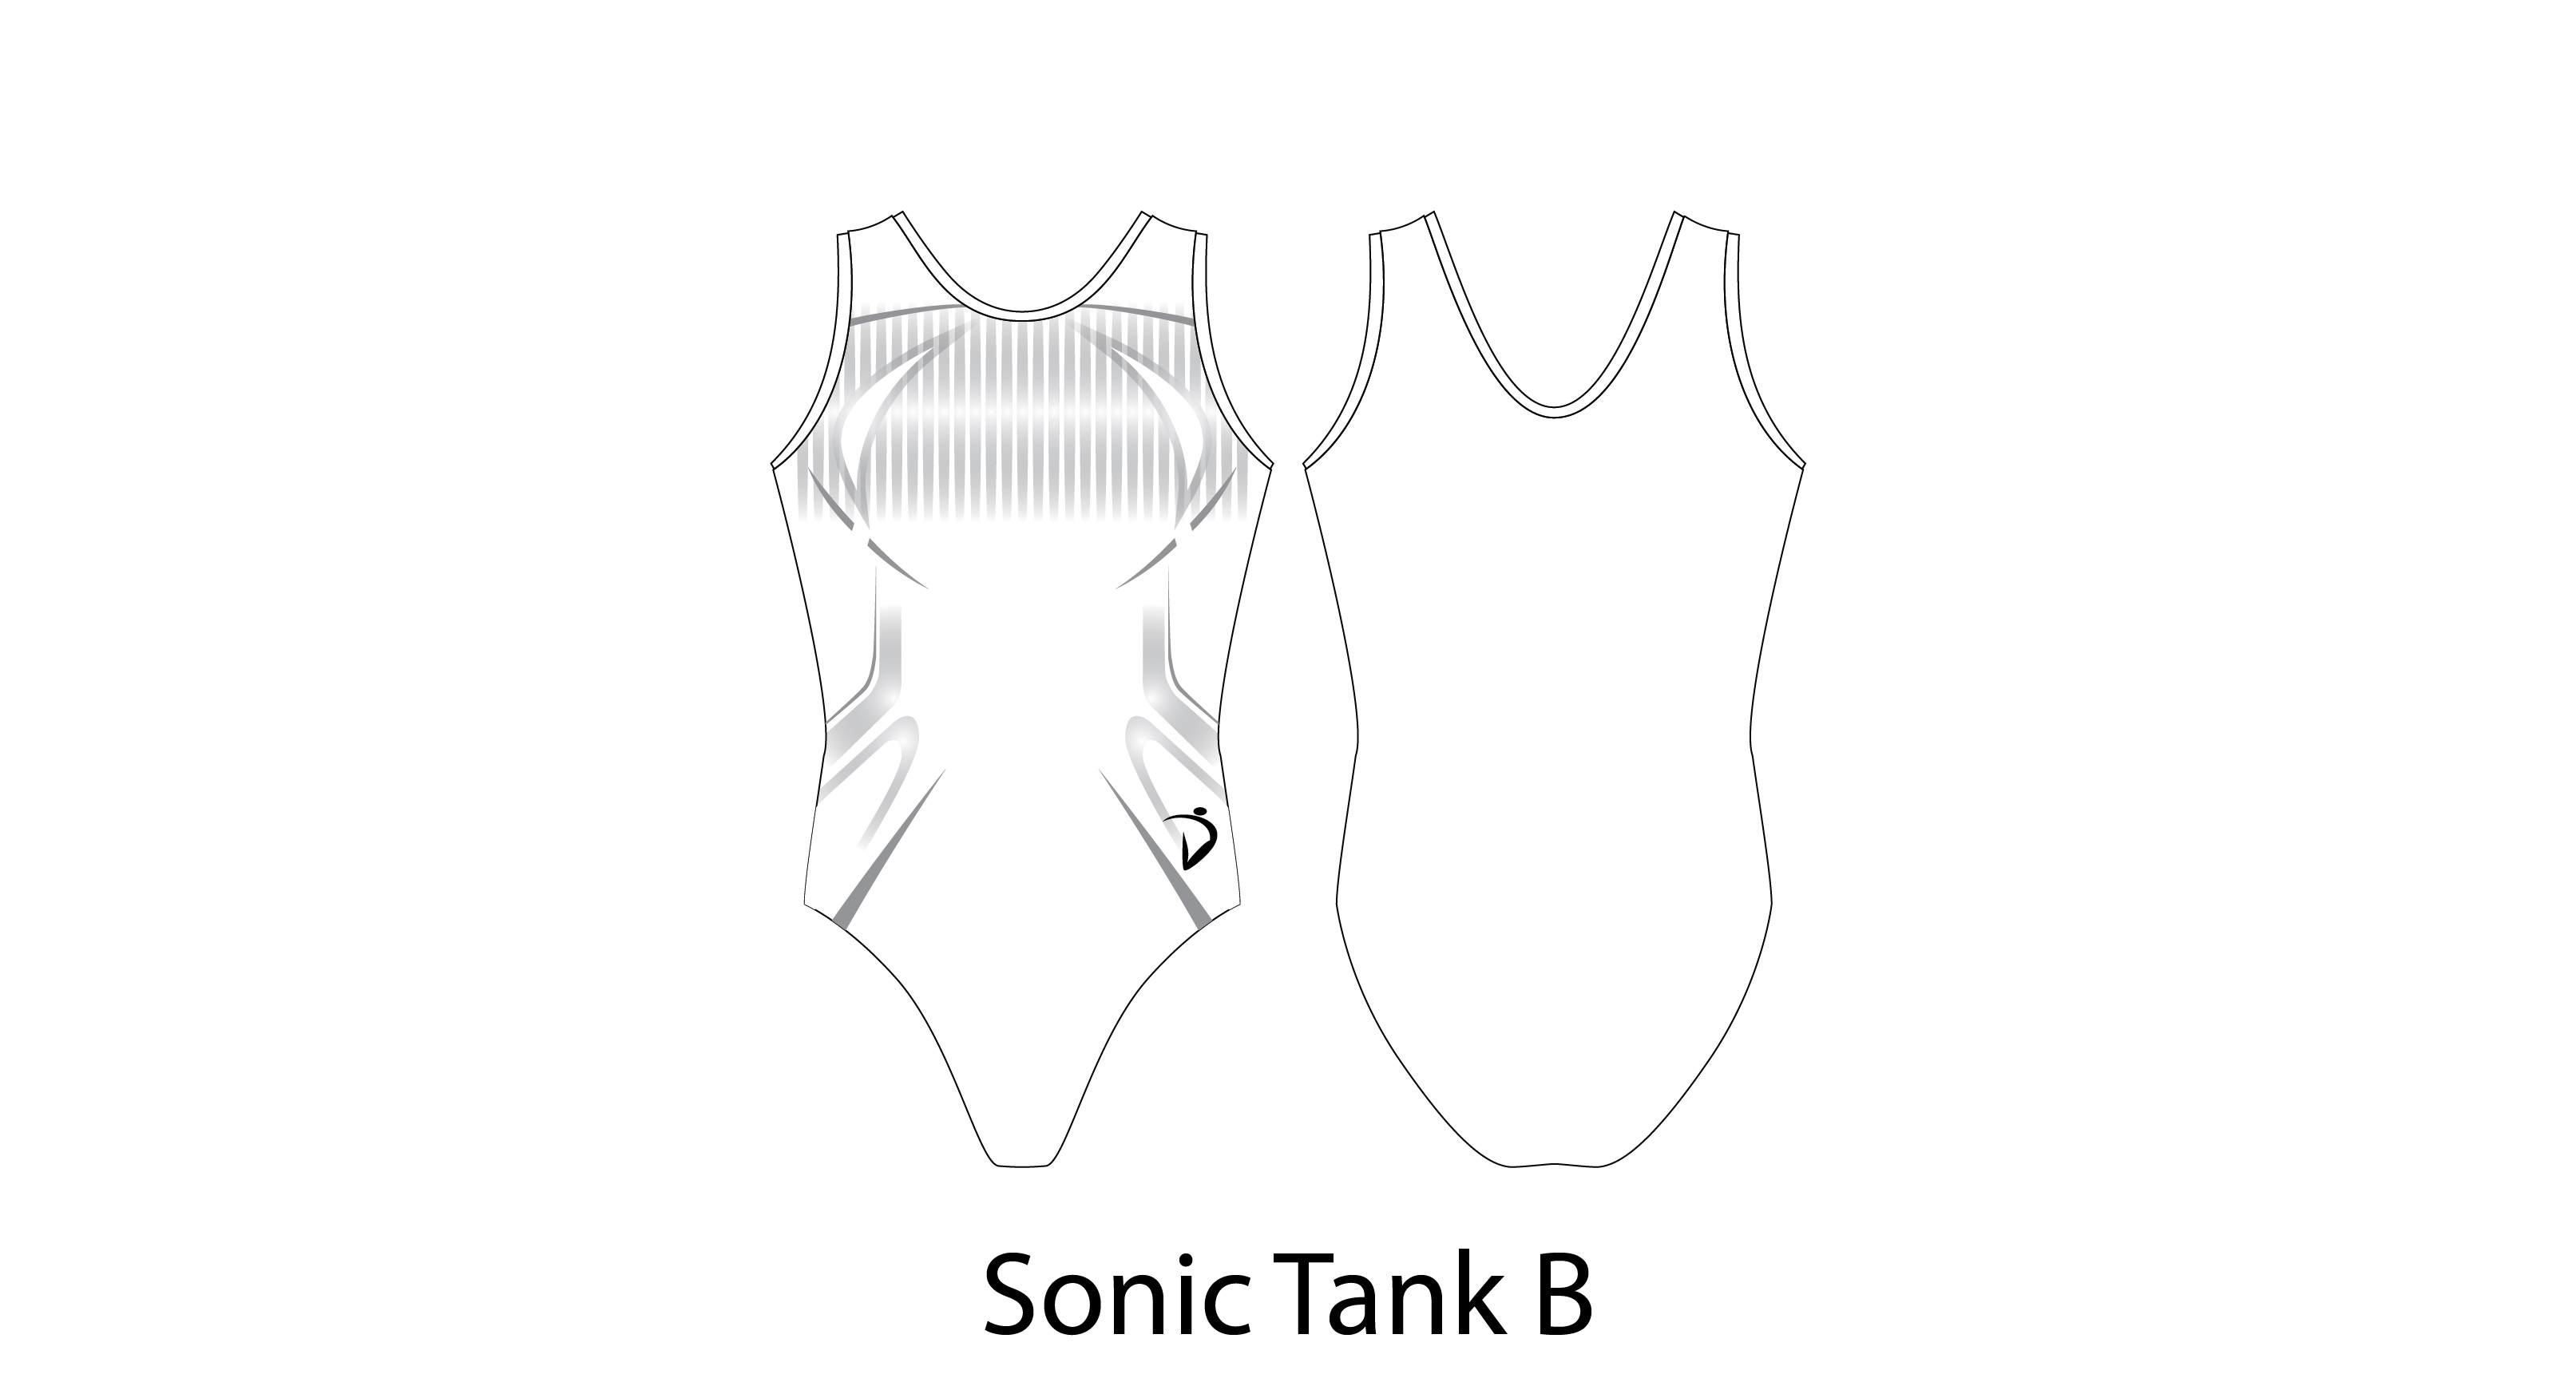 Sonic Tank B